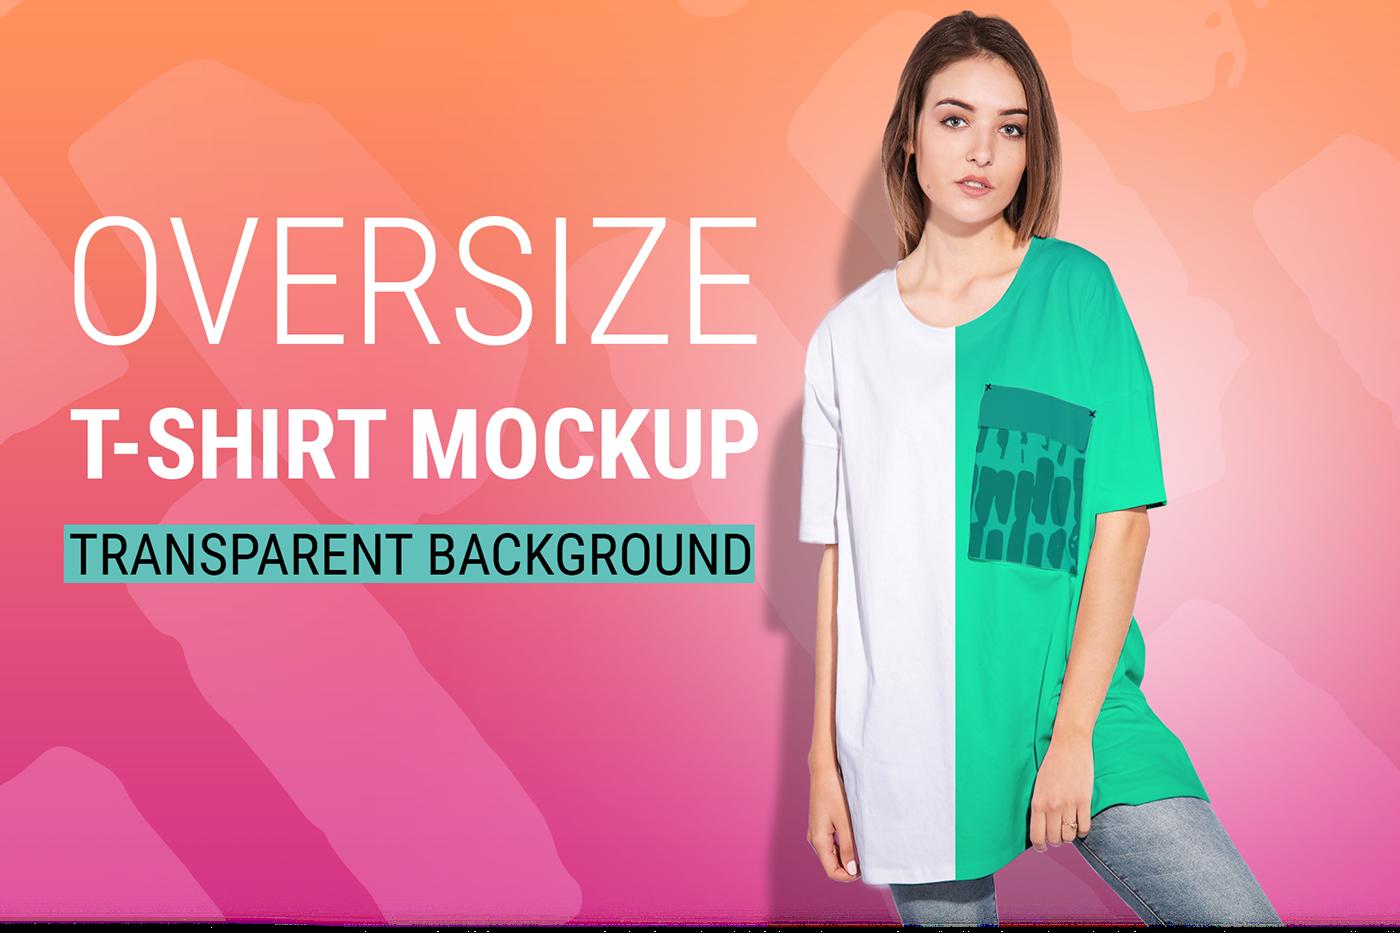 Download Woman Oversize T Shirt Mockup Free Shirt Mockup Tshirt Mockup Oversized Tshirt